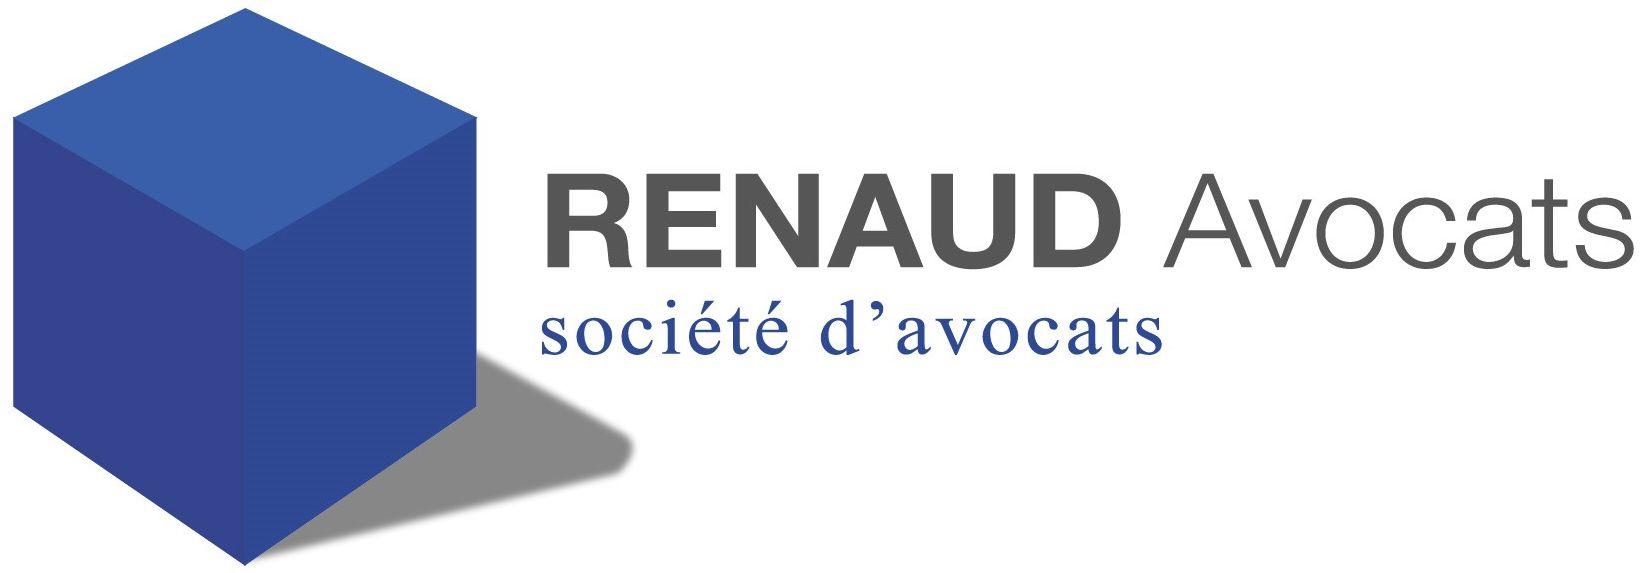 Renaud Avocats